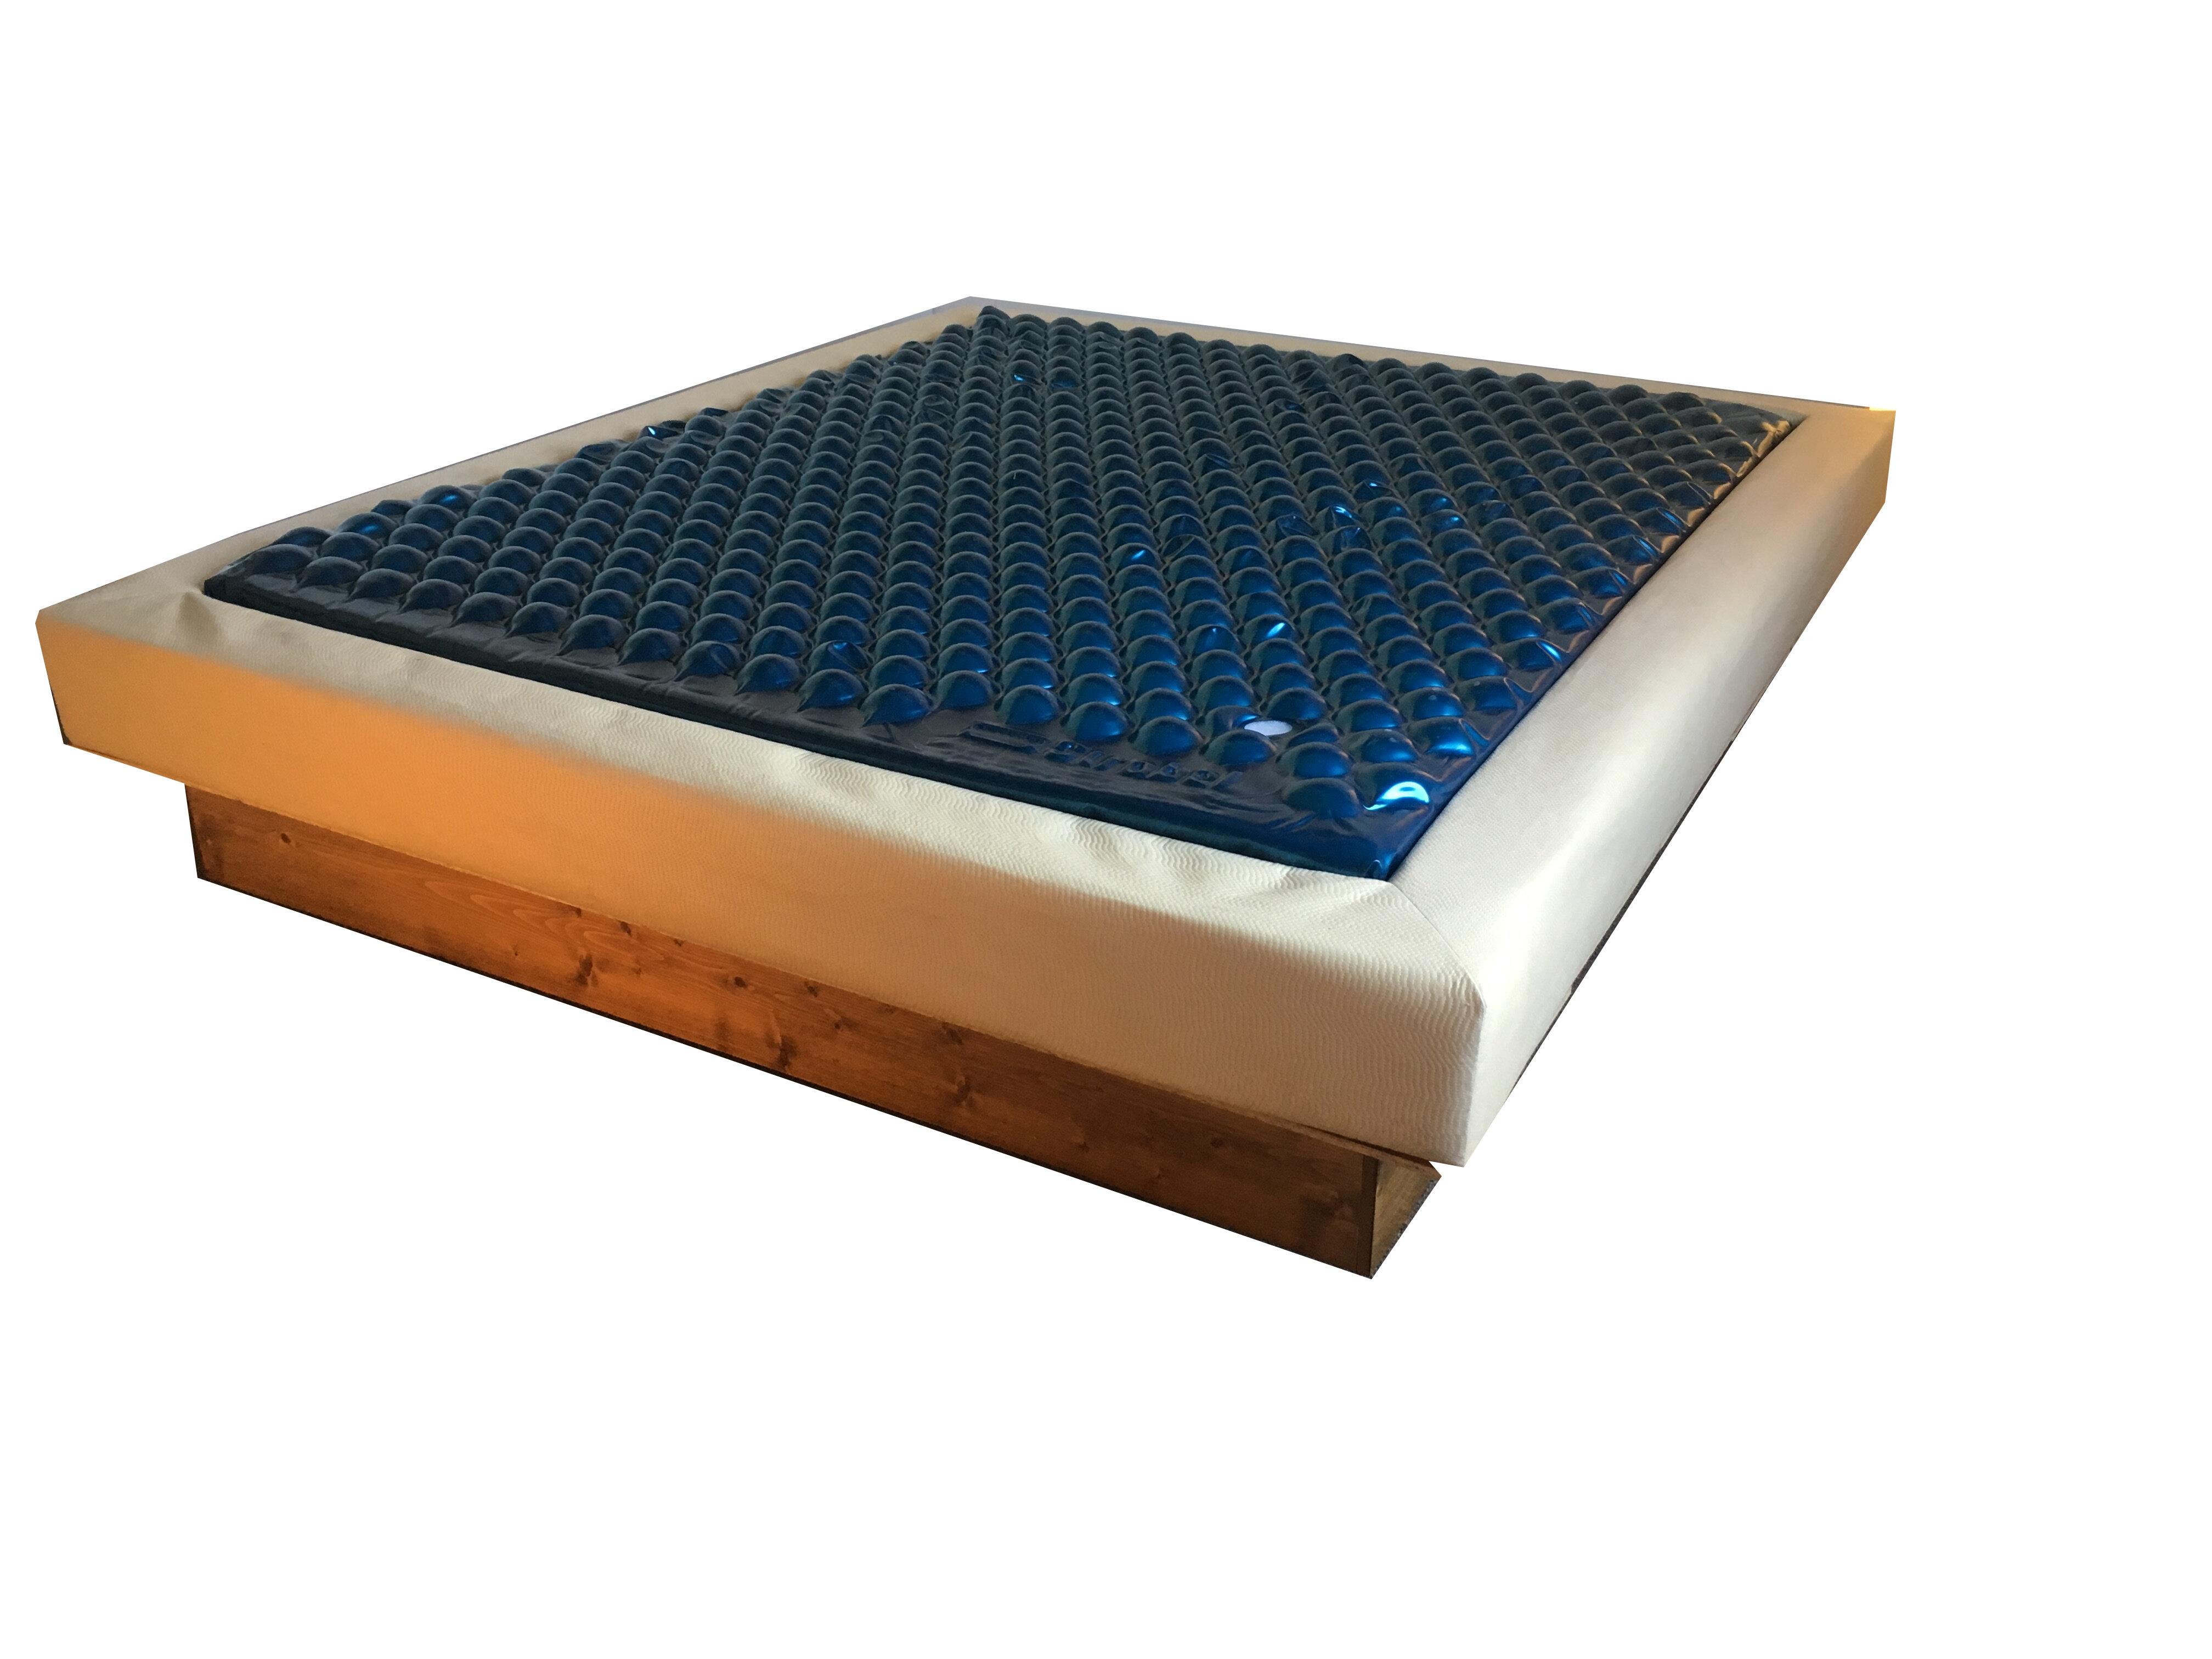 Strobel Technologies Sof Frame Complete 20 Hard Side Waterbed Mattress Wayfair